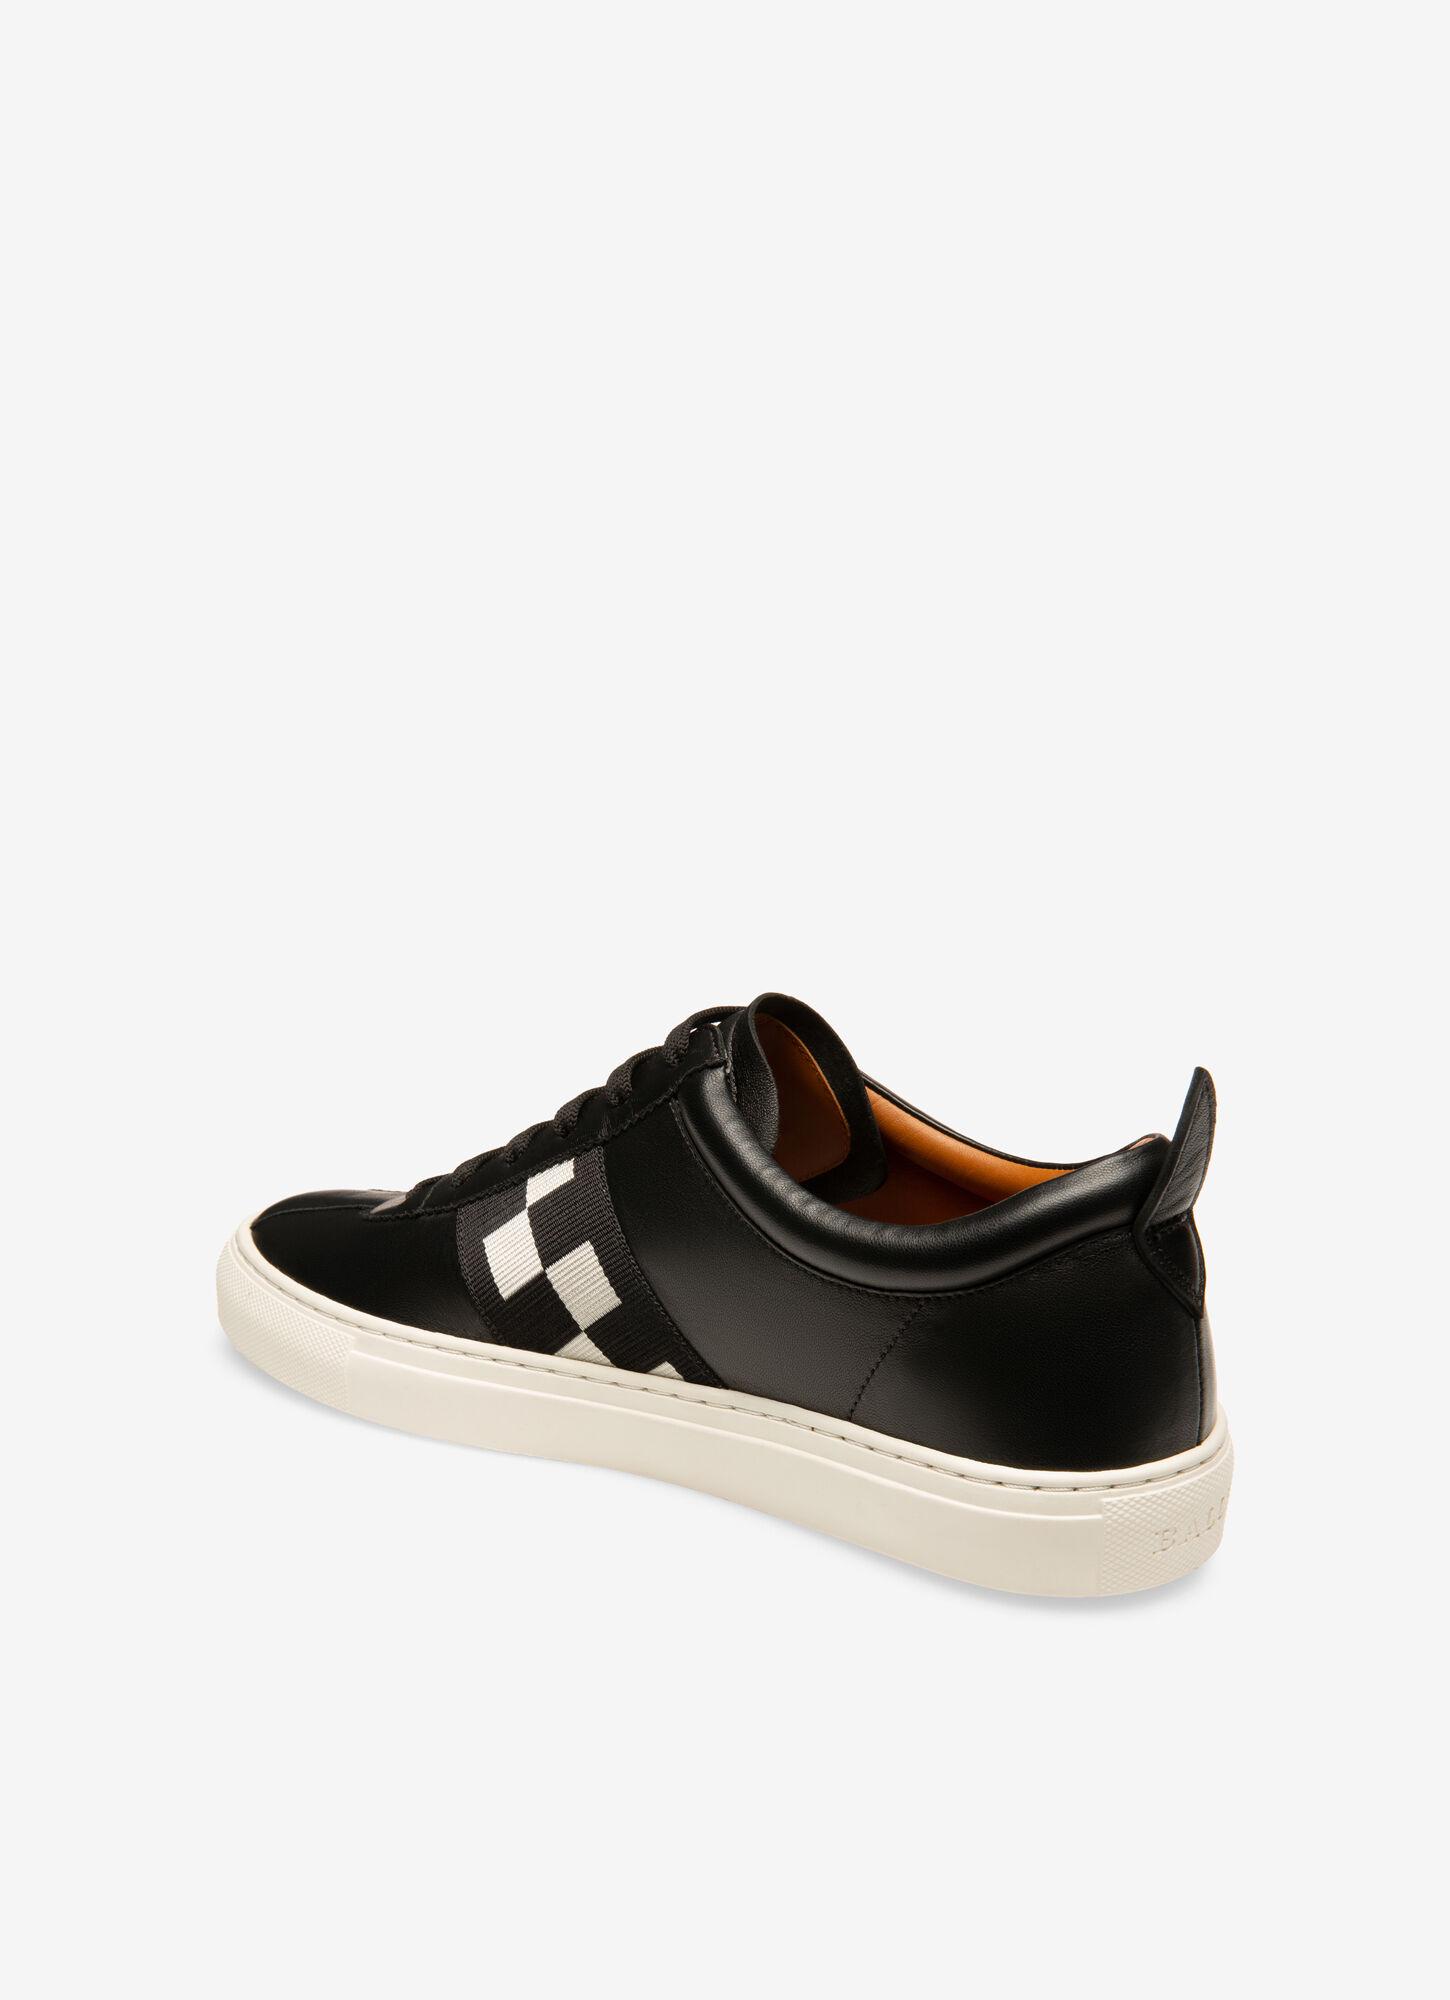 Men's Vita-Parcours Retro Sneaker